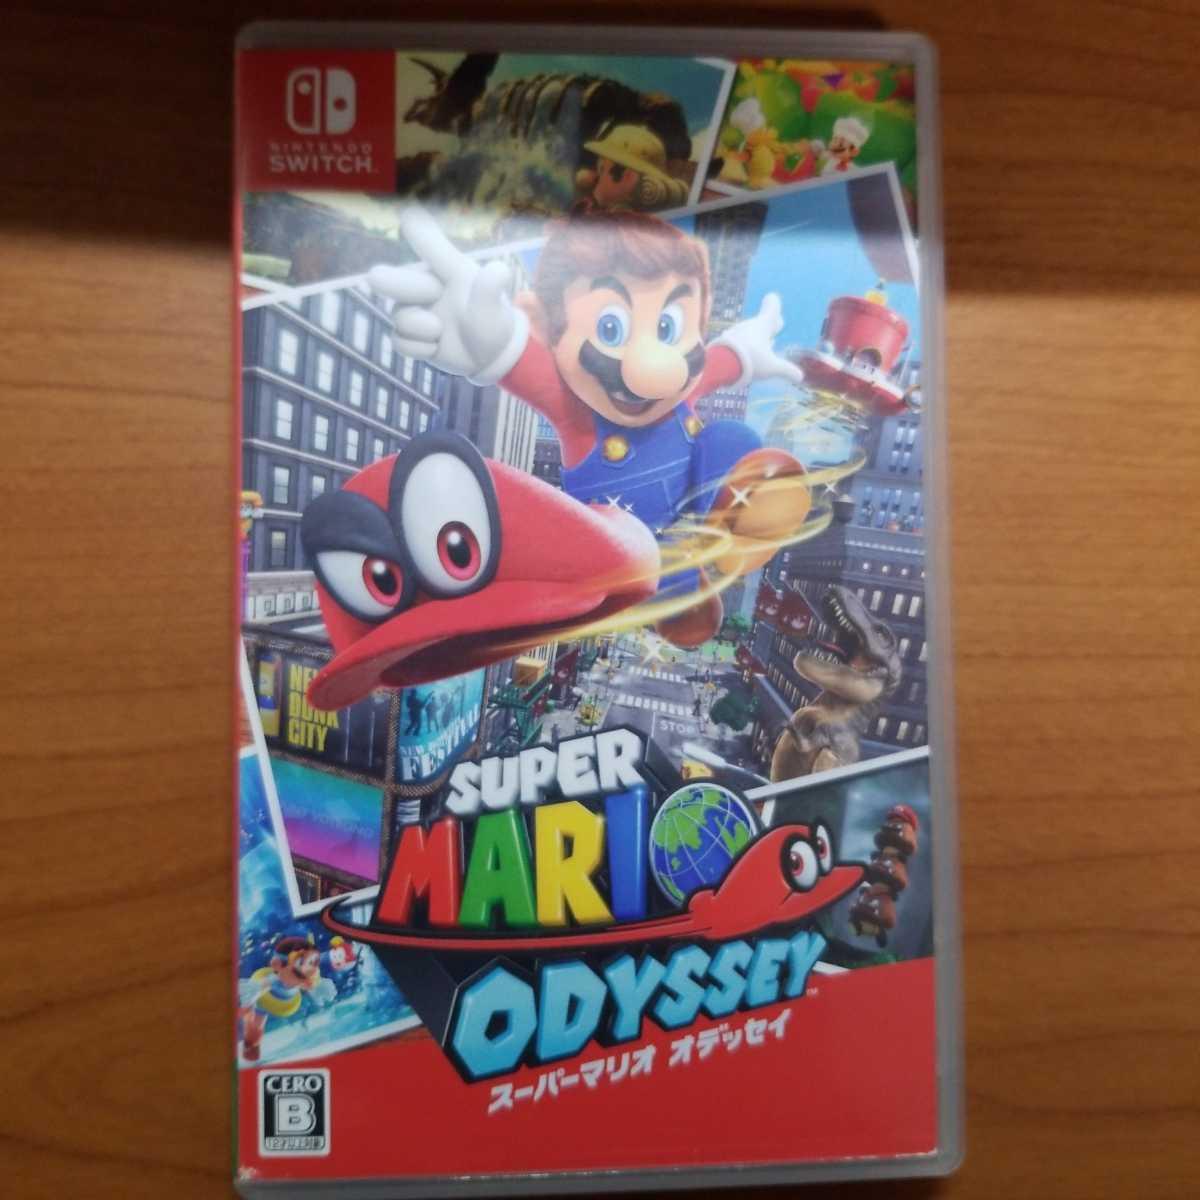 Switch スーパーマリオオデッセイ Nintendo Switch スーパーマリオ オデッセイ ニンテンドースイッチ ソフト 送料無料